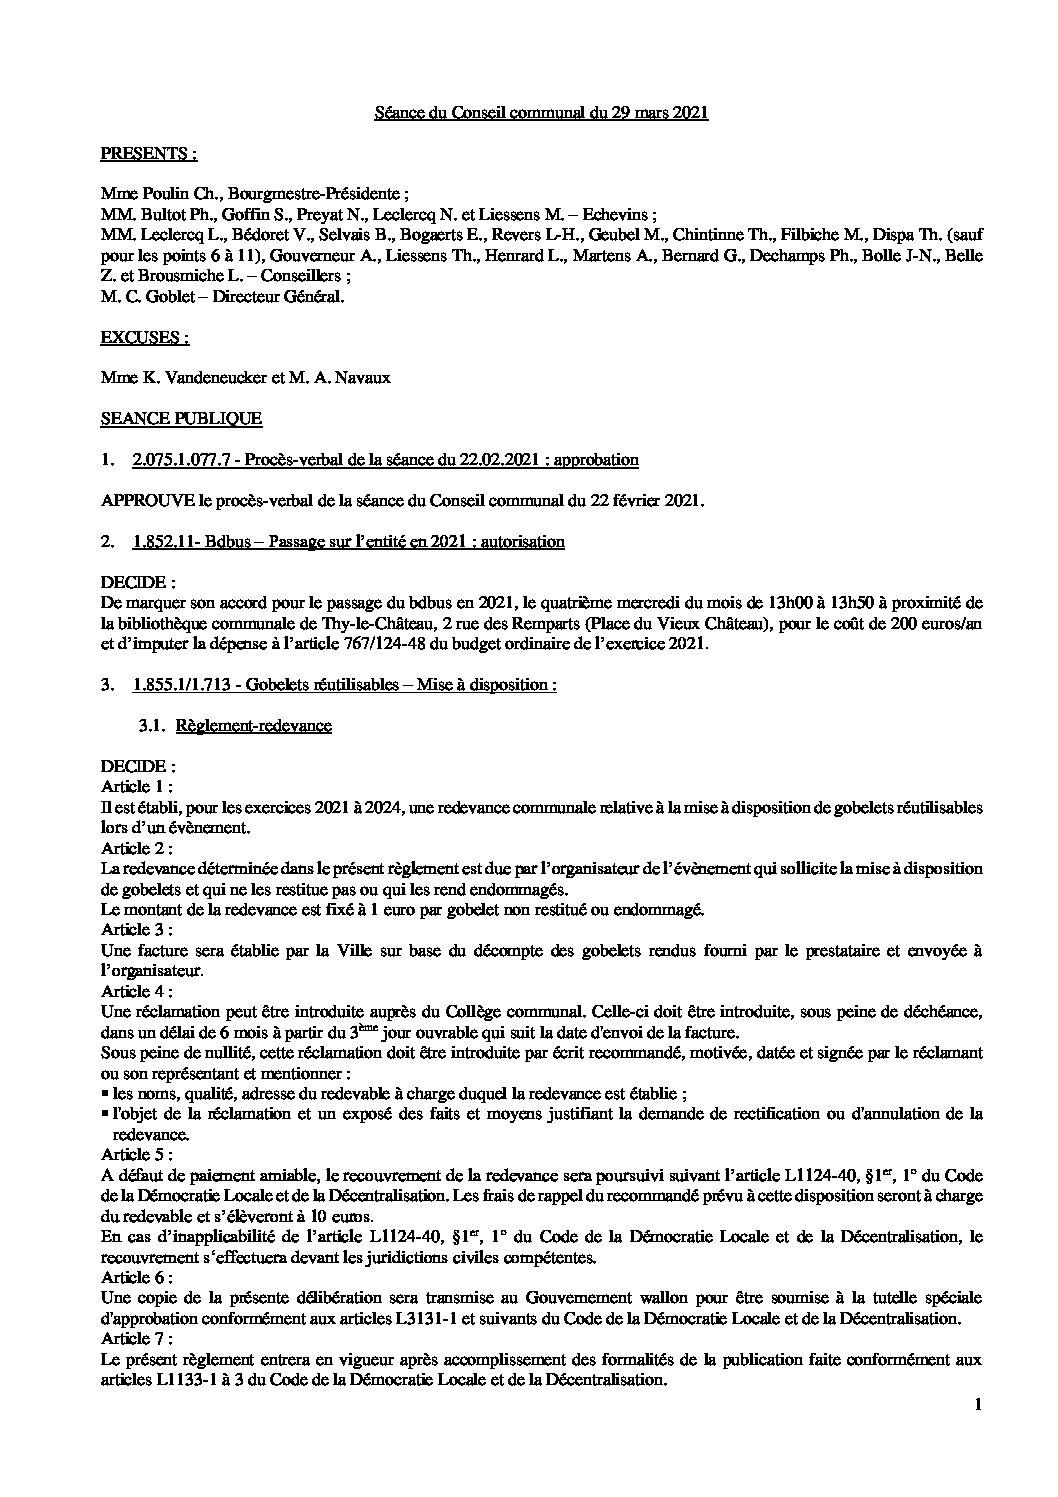 Conseil communal – 29 mars 2021